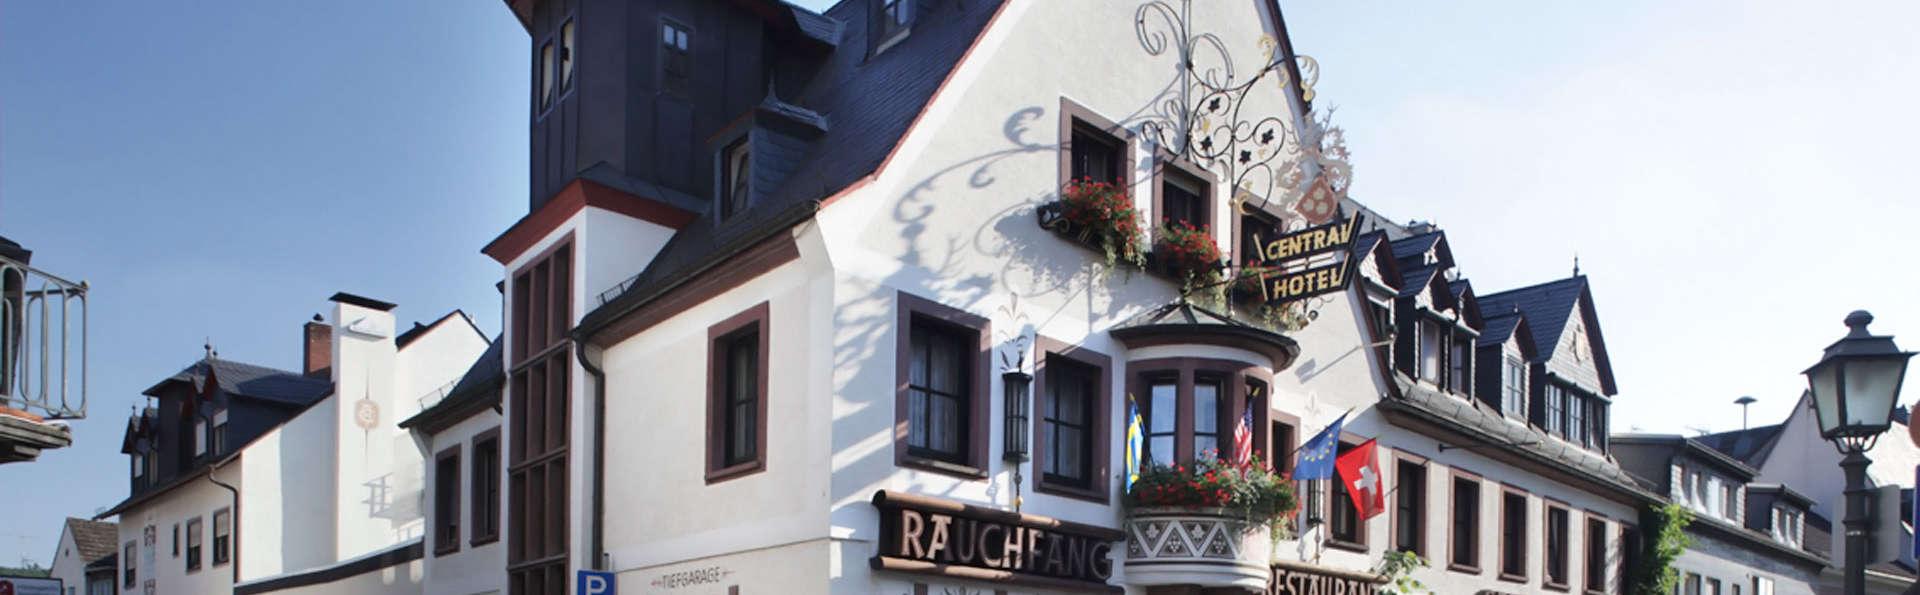 Central Hotel Ringhotel Rüdesheim - EDIT_front.jpg